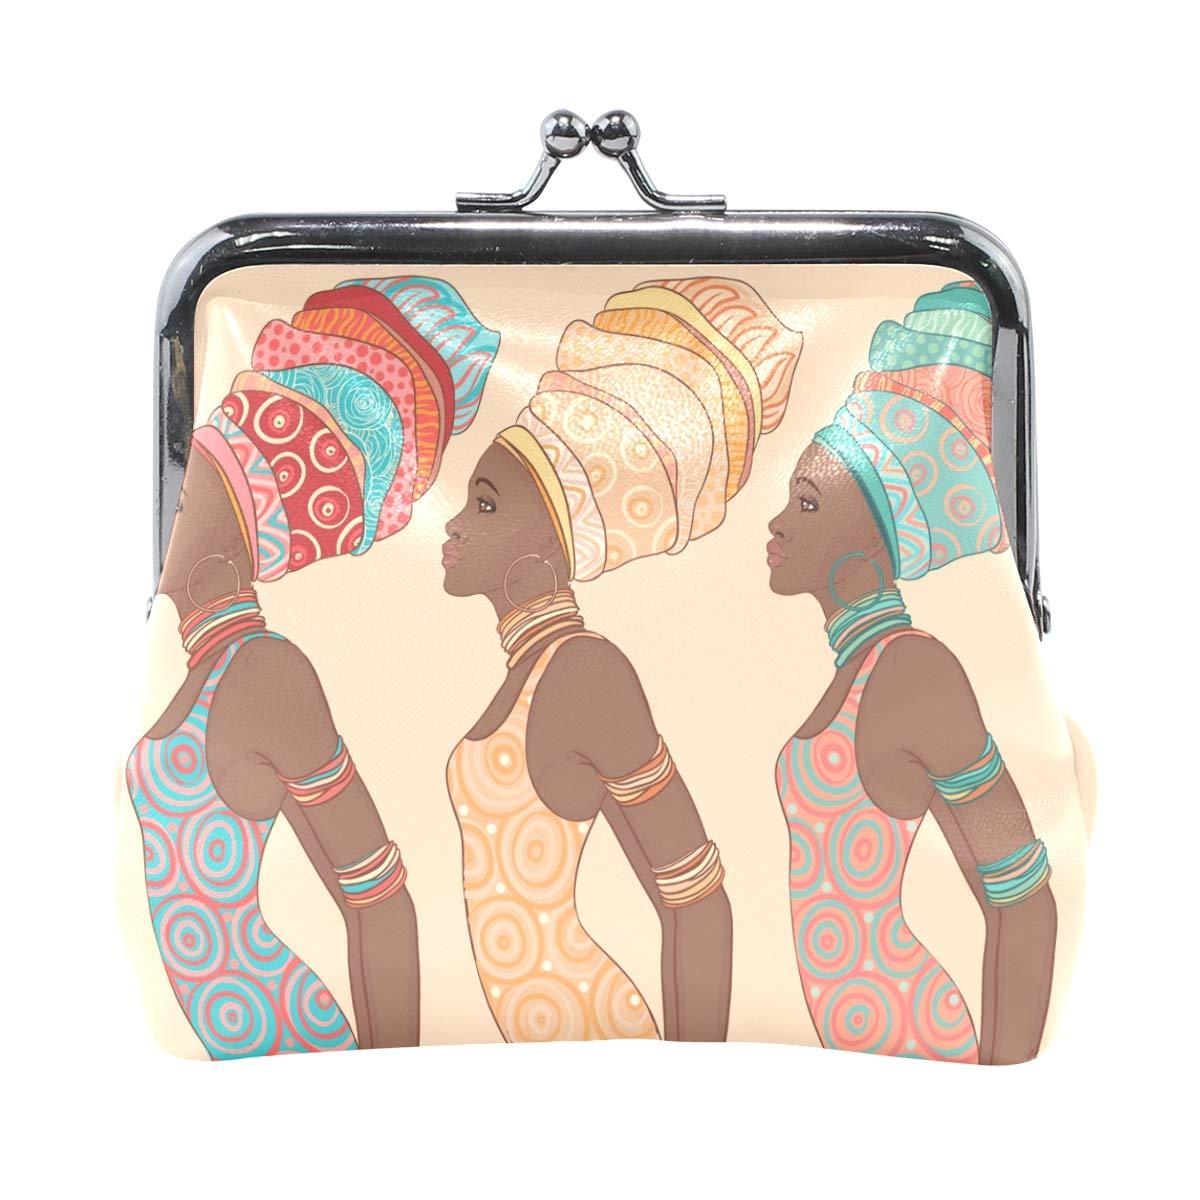 Fashion Womens Coin Purse African Woman Vintage Pouch Mini Purse Wallets